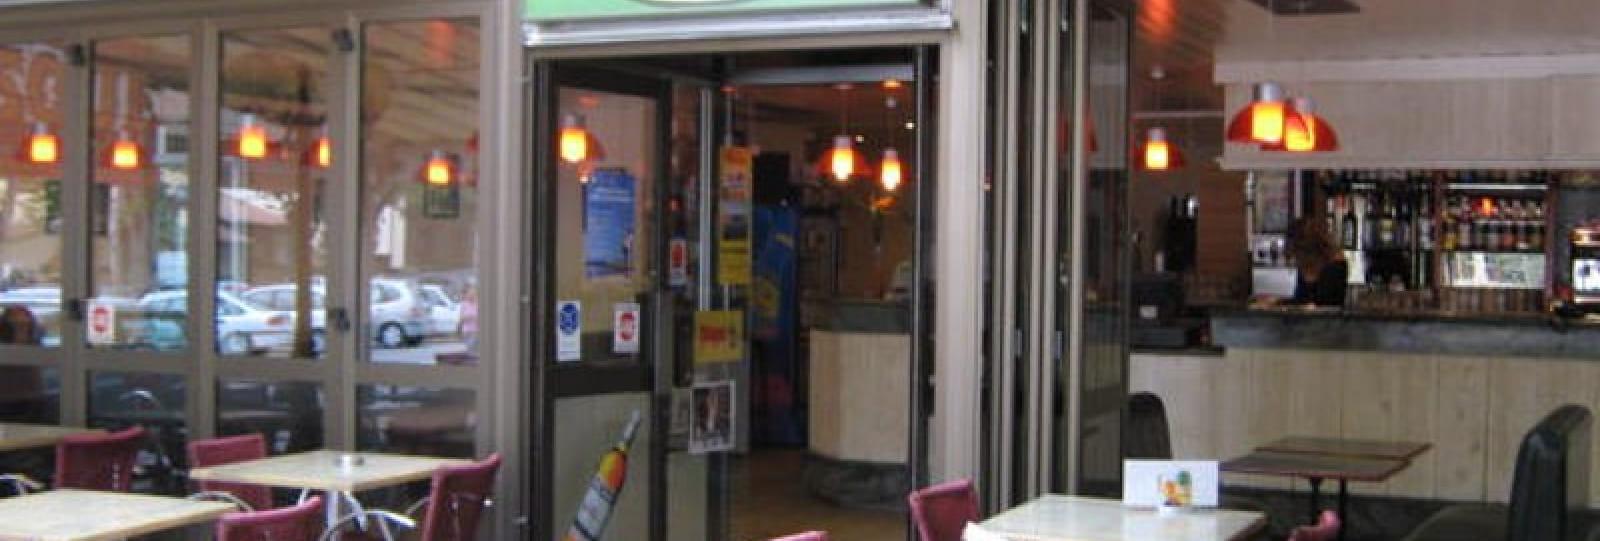 Brasserie Le Kiosque